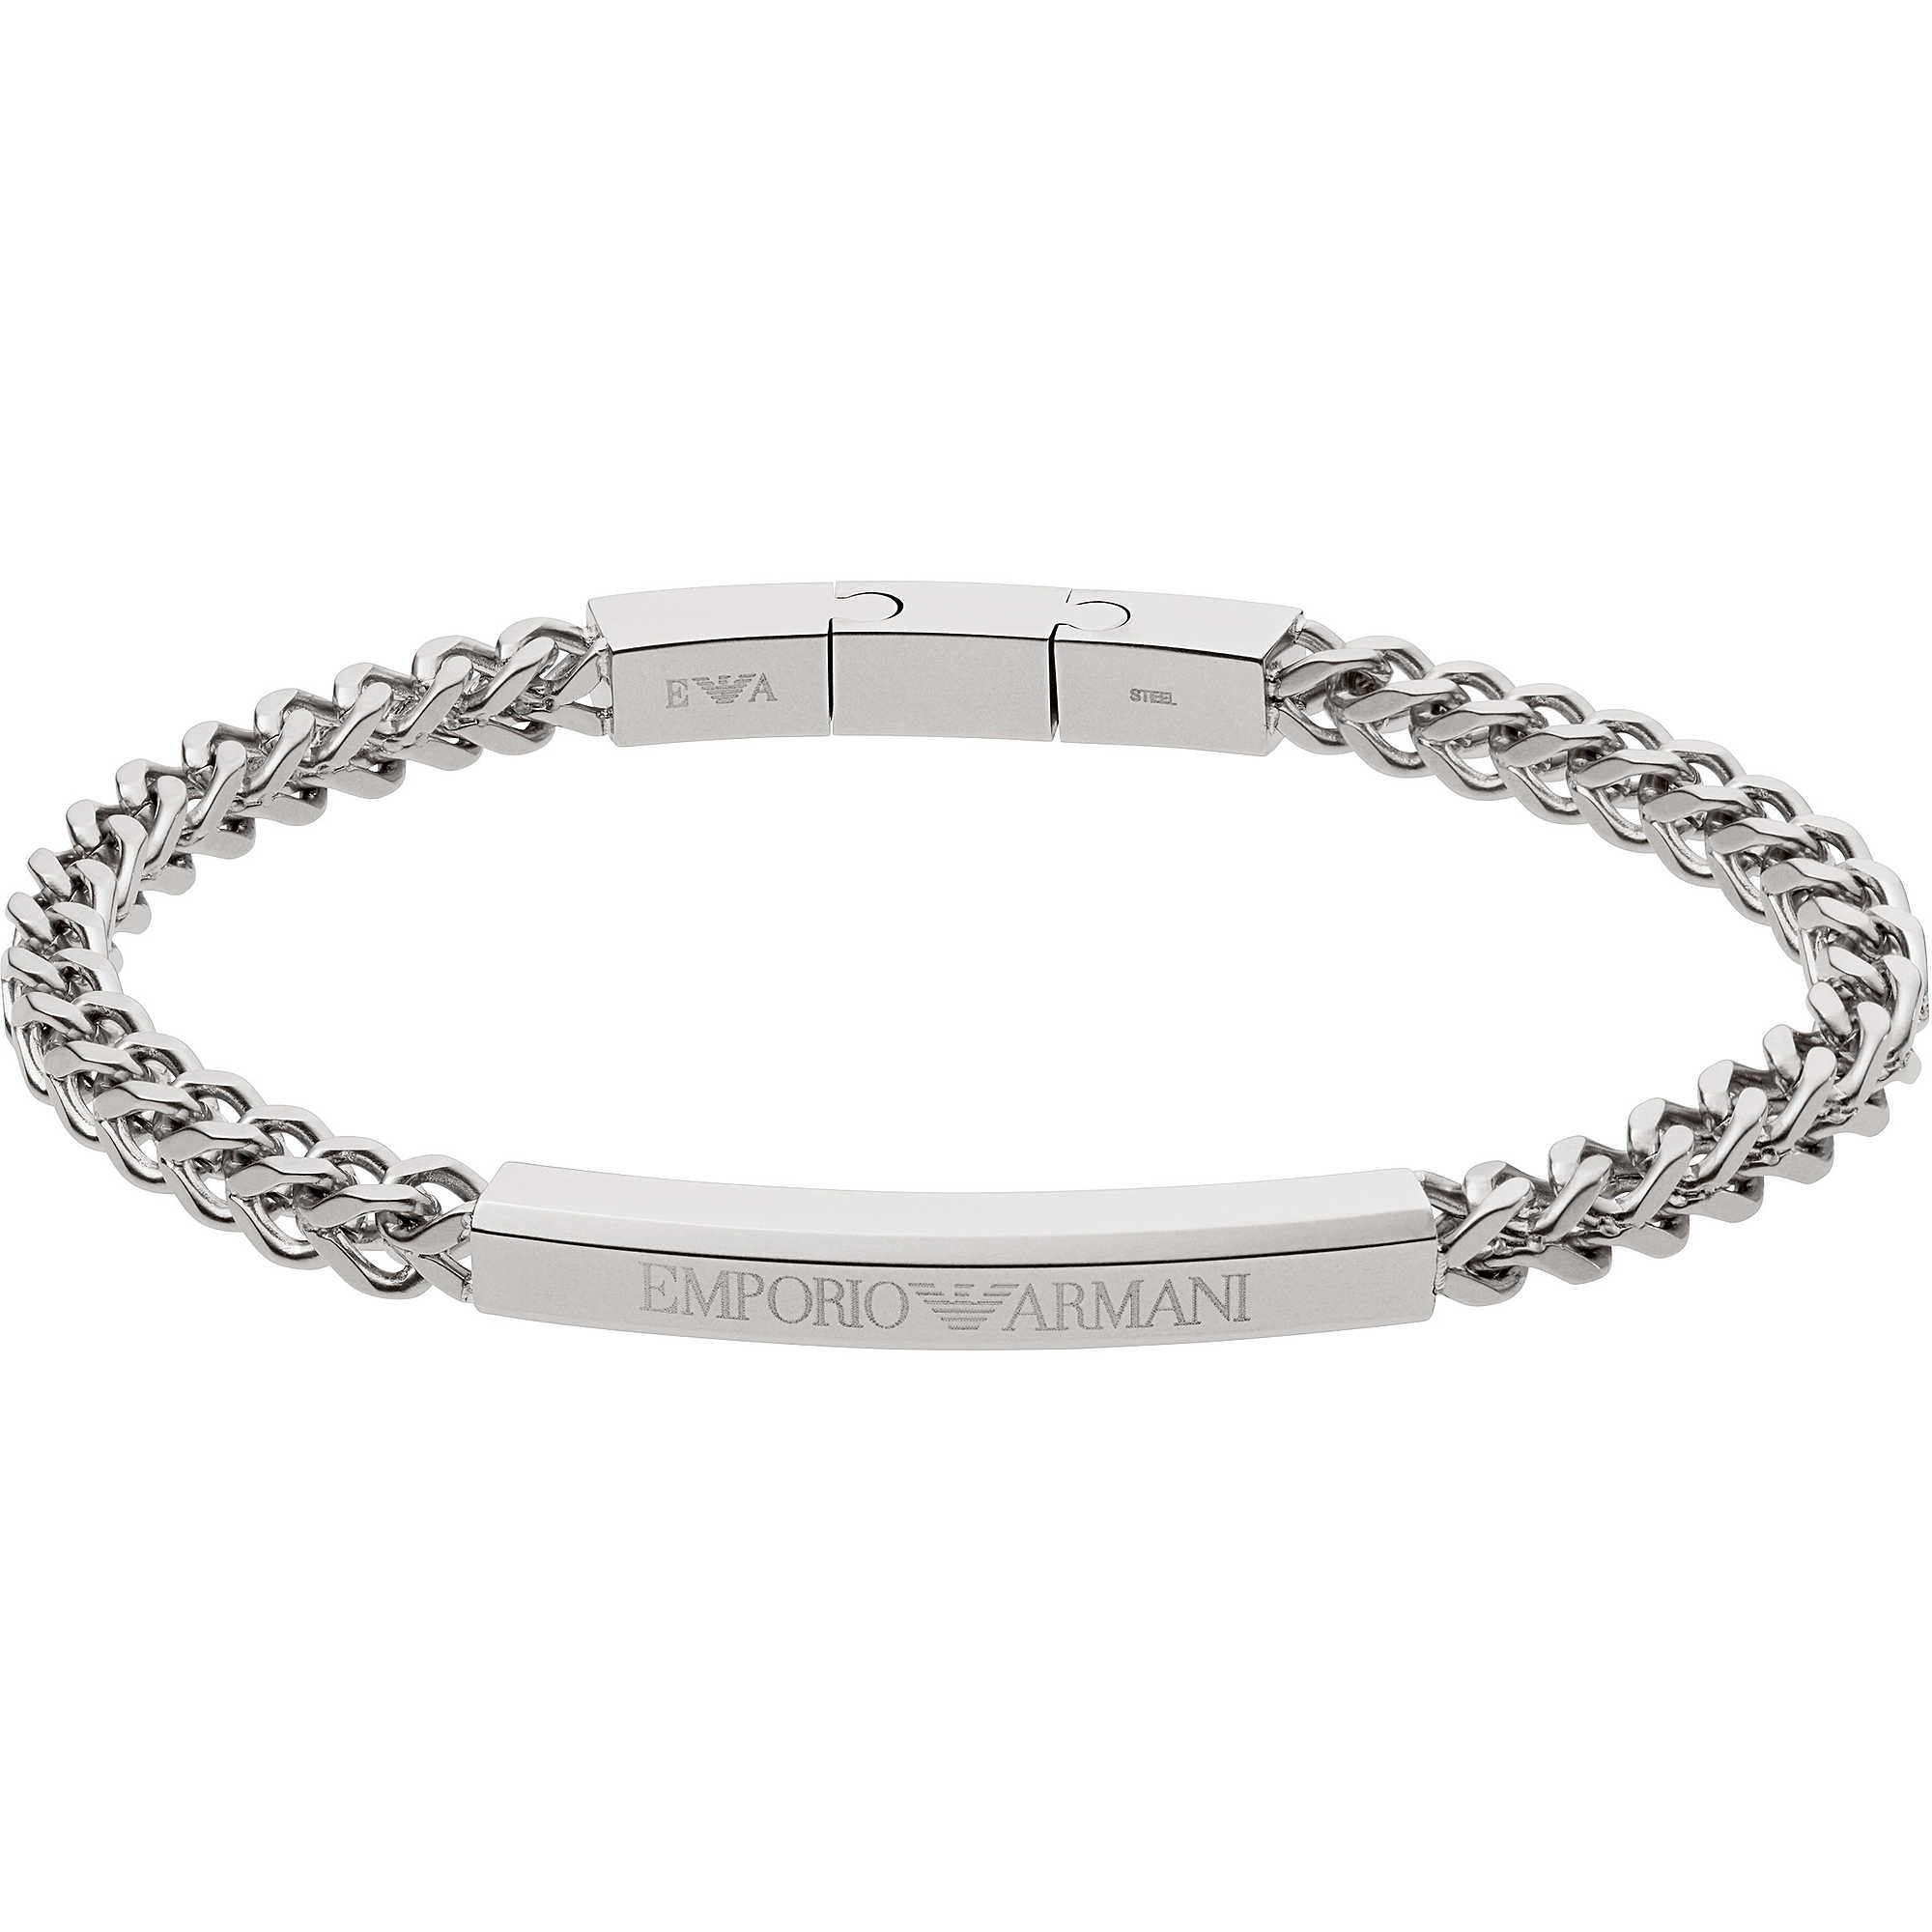 bracelet man jewellery Emporio Armani EGS2416040 bracelets Emporio ... bd8f07400b9